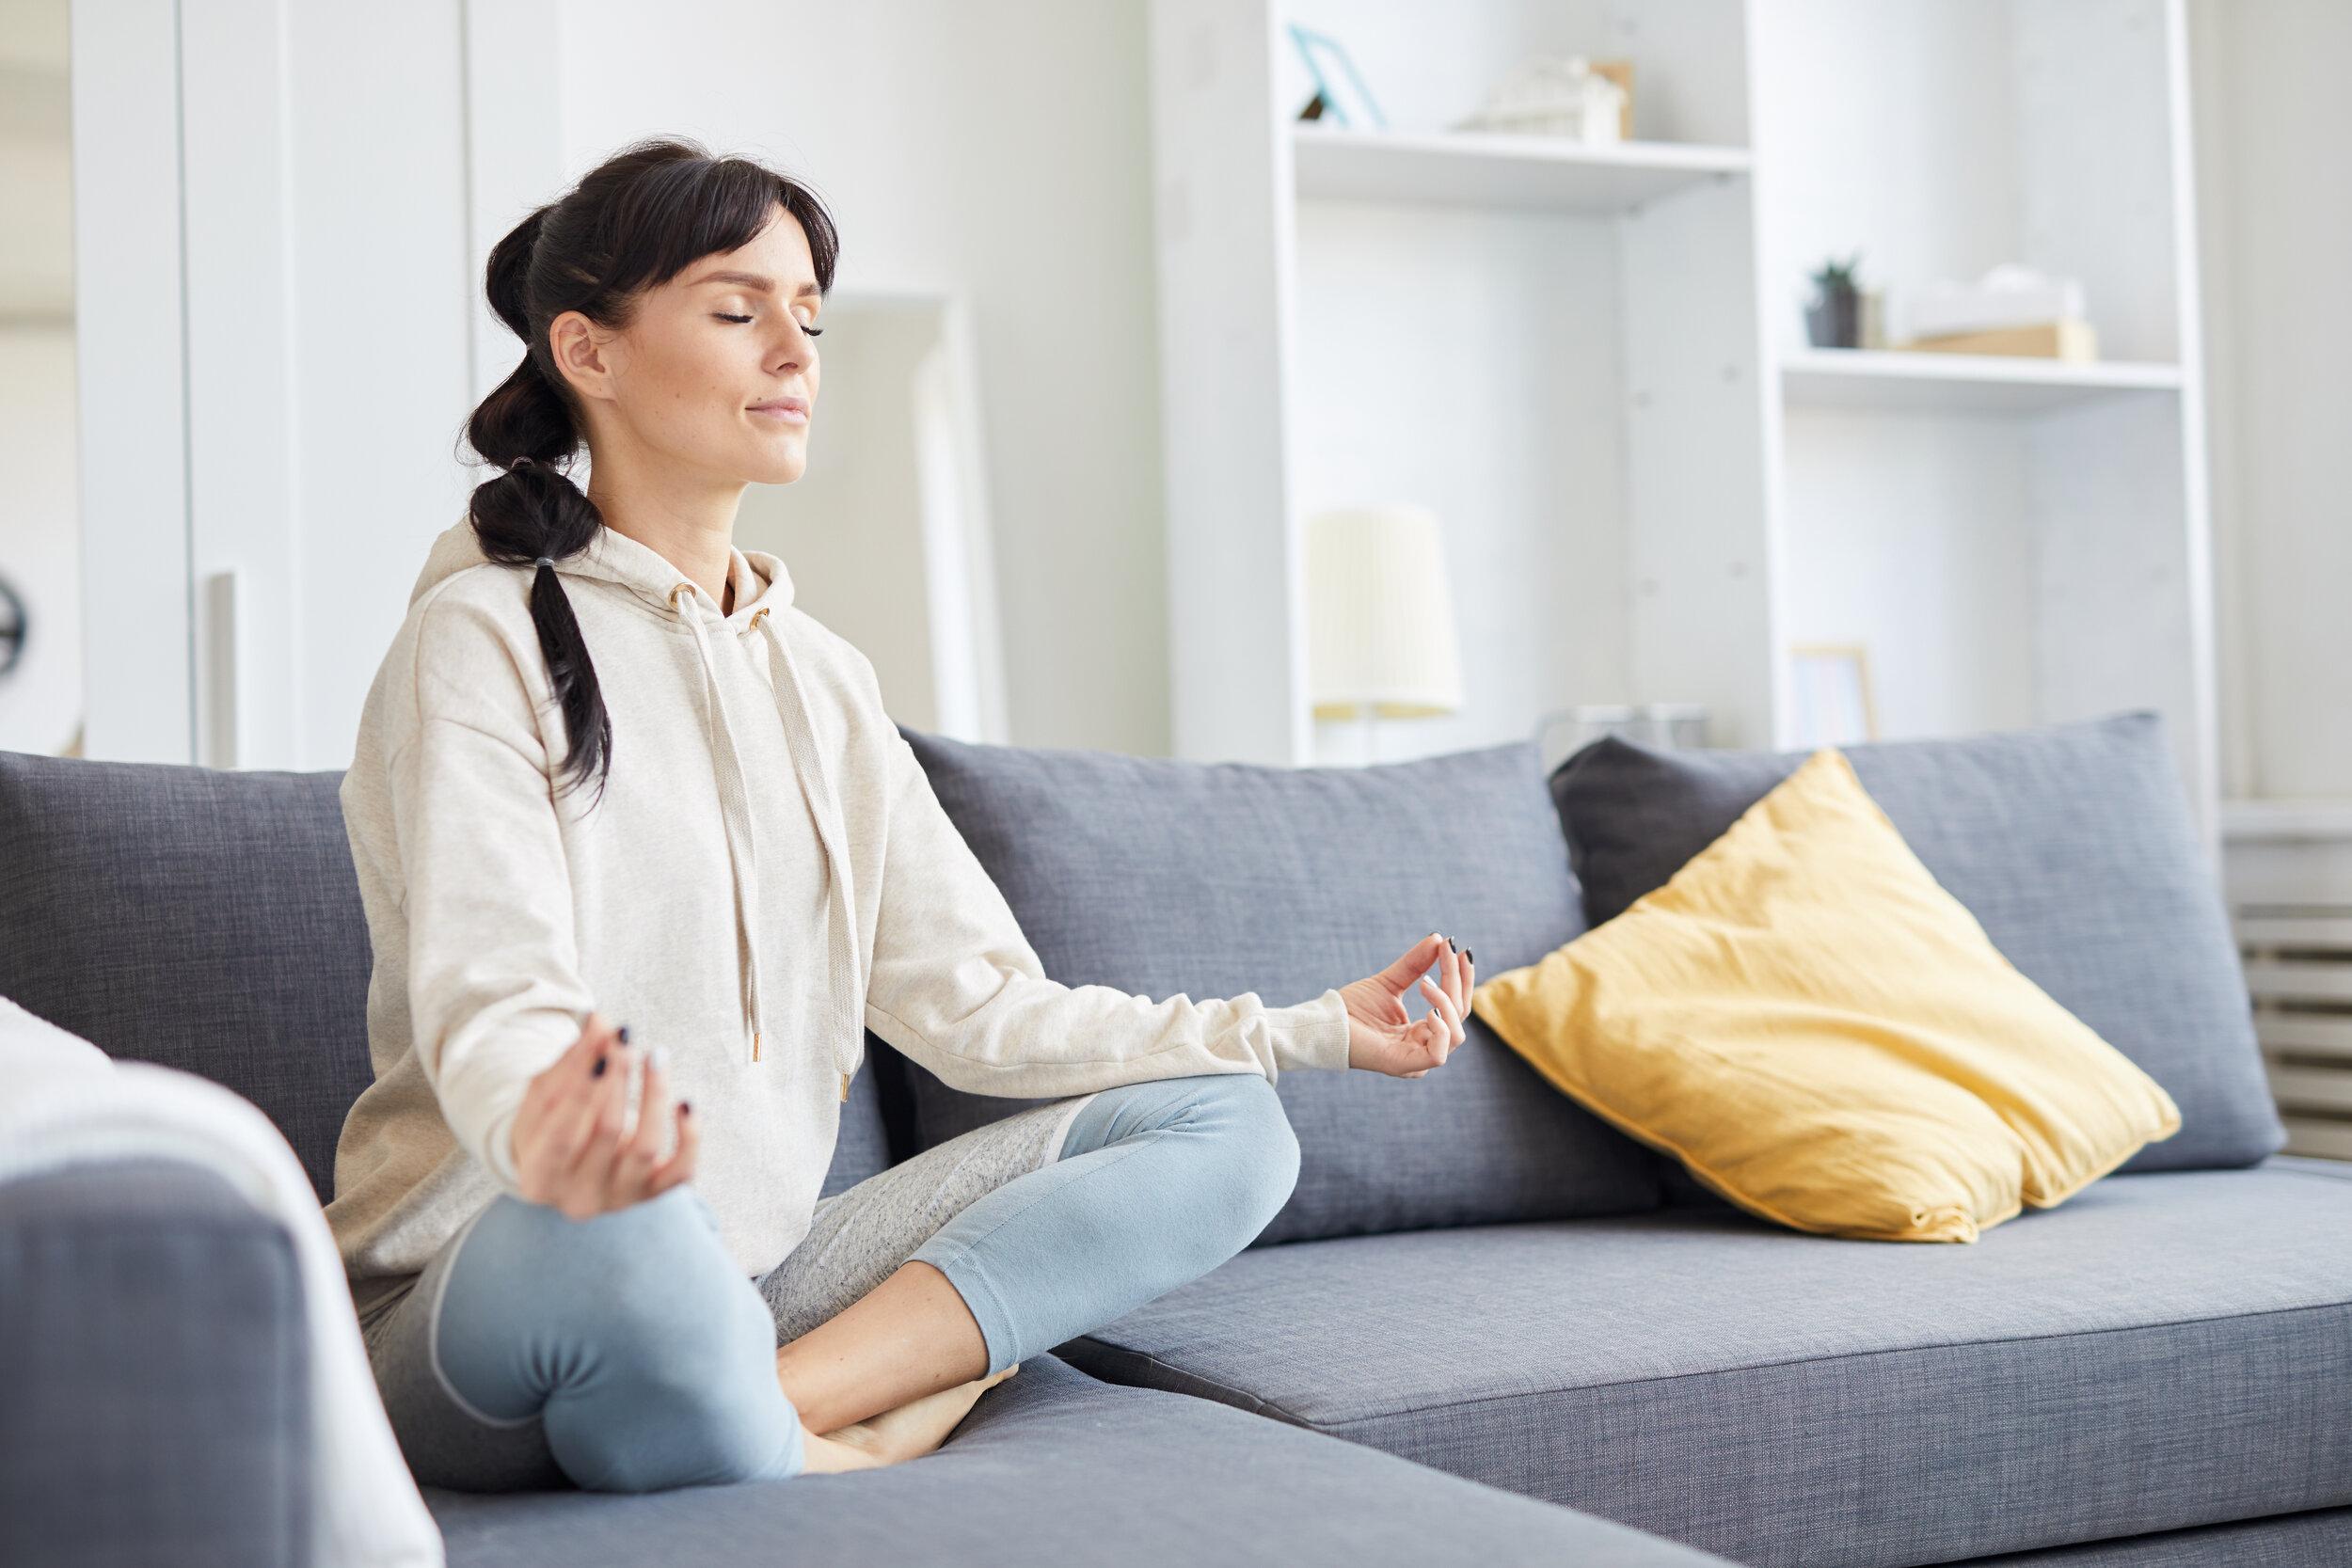 woman-practicing-yoga-BU5K9RX.jpg